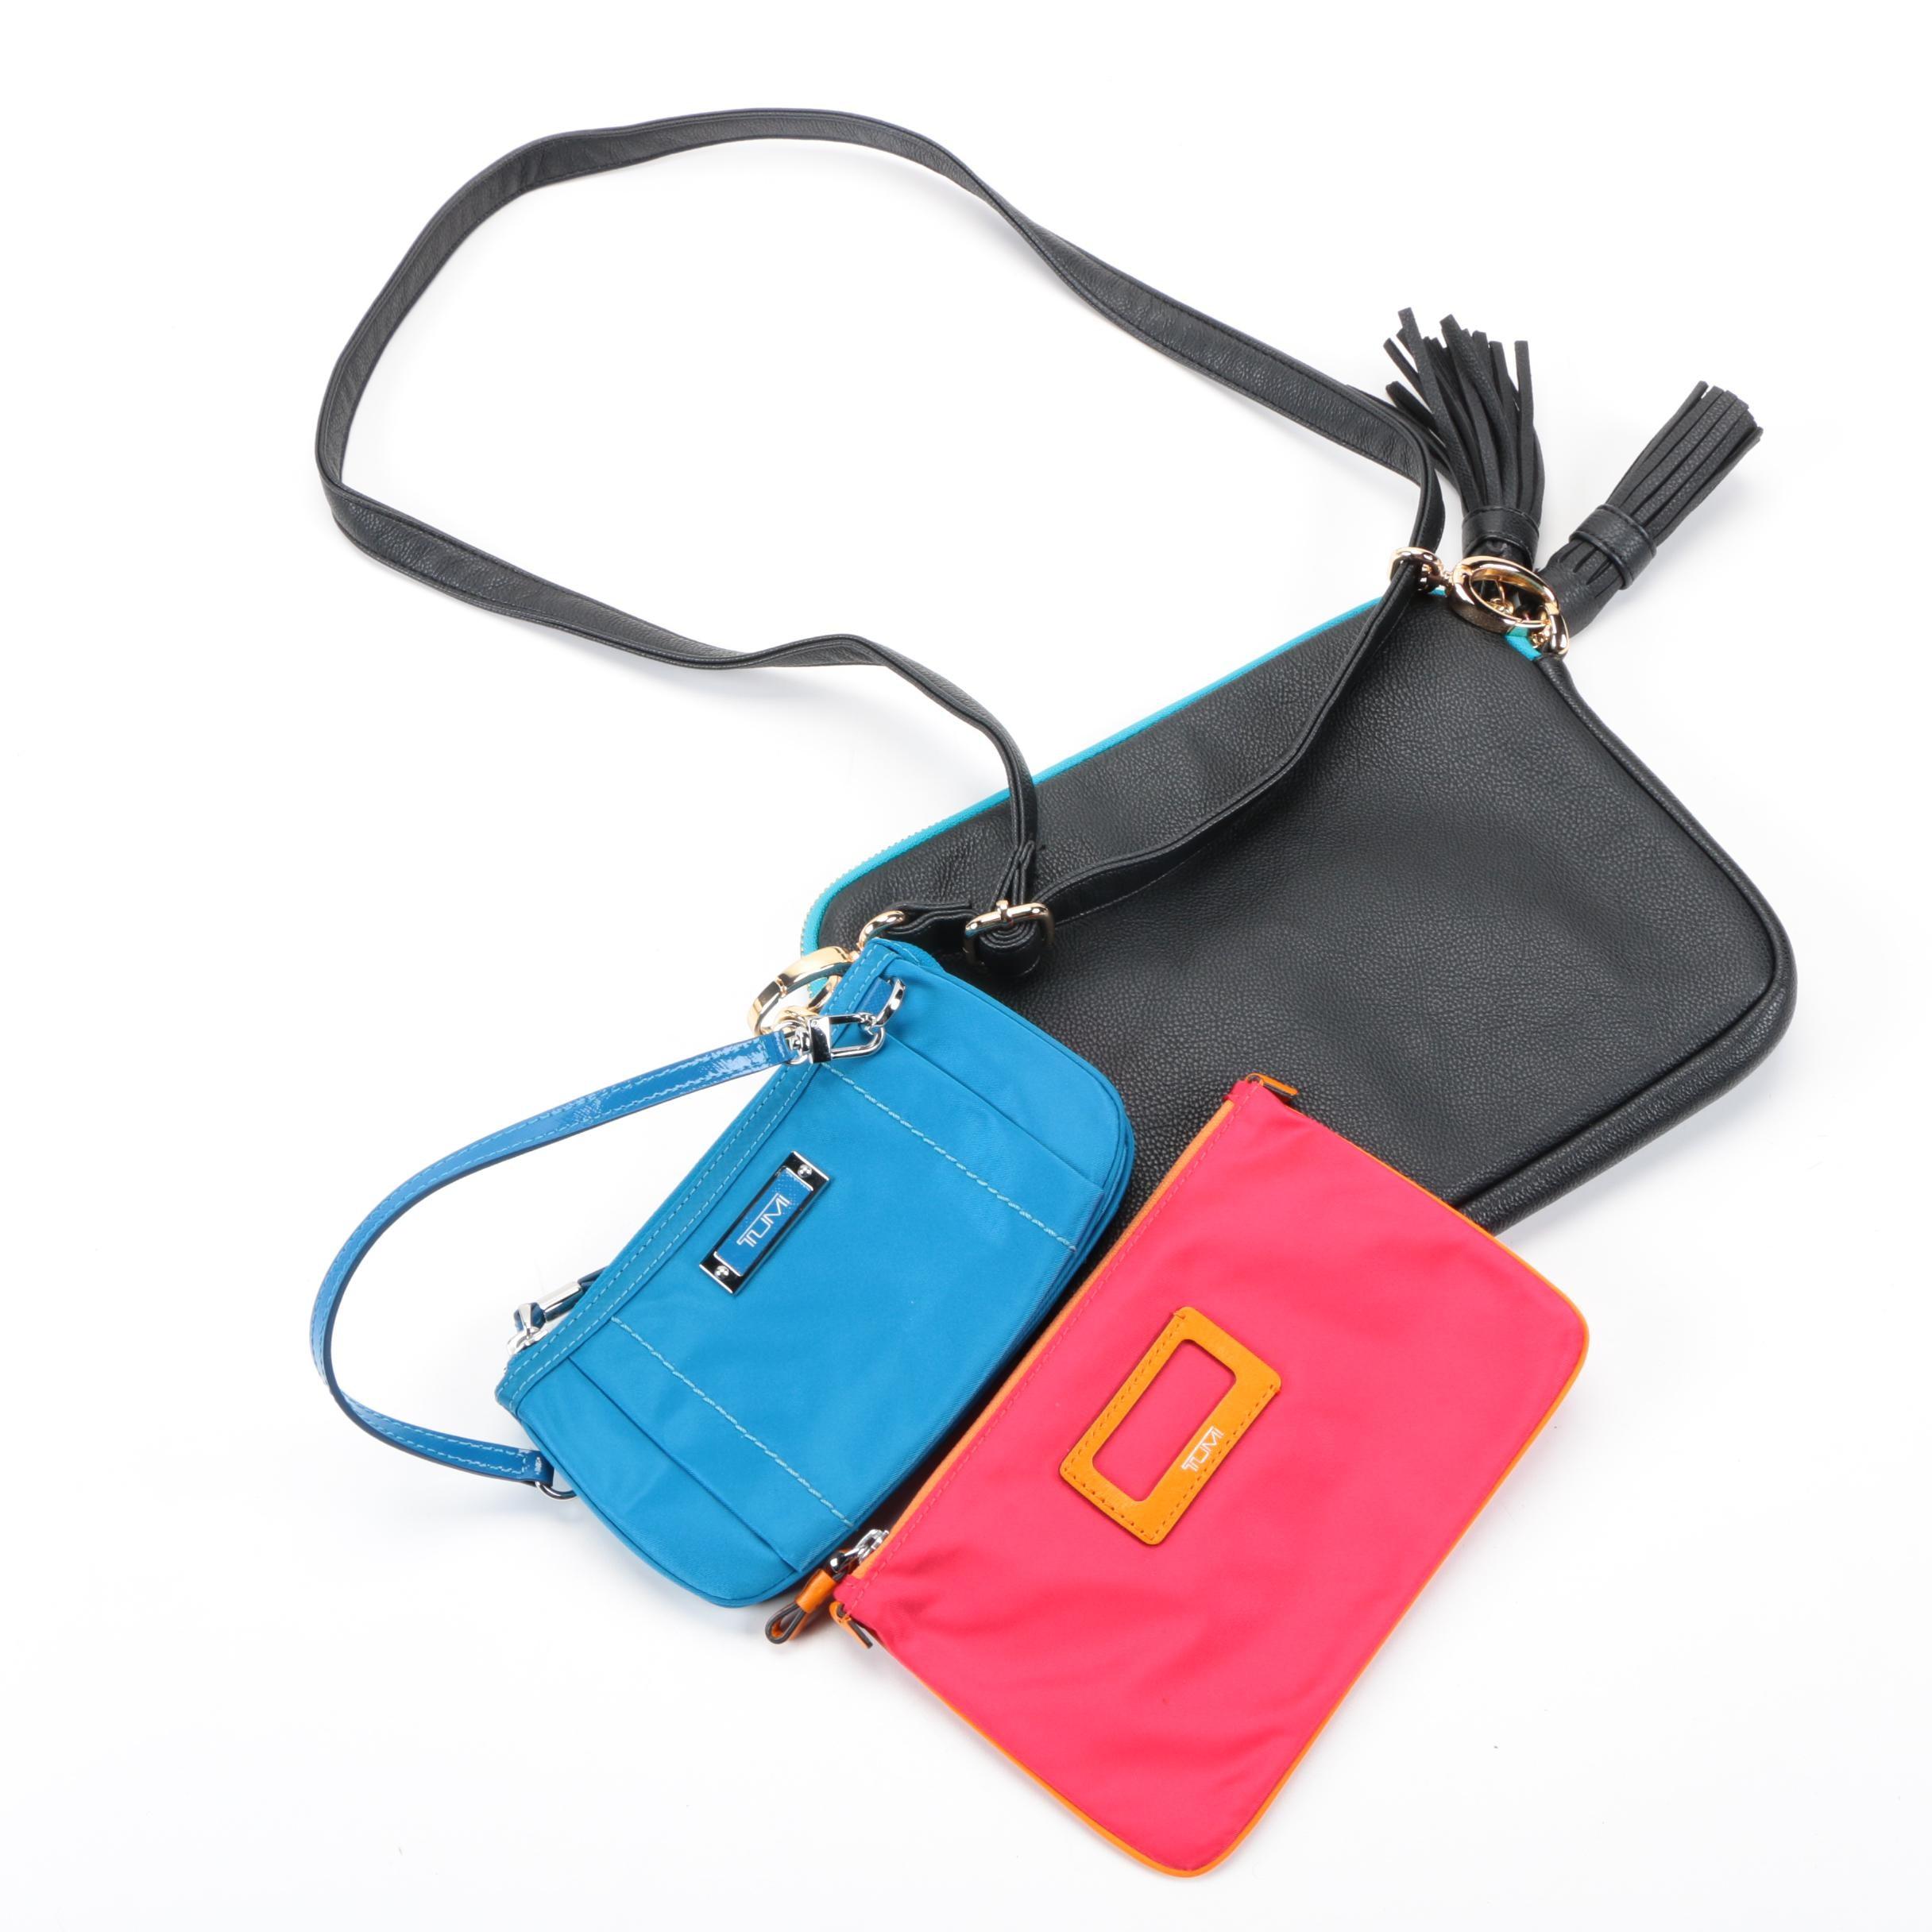 Crossbody Handbag with Tumi Wristlets